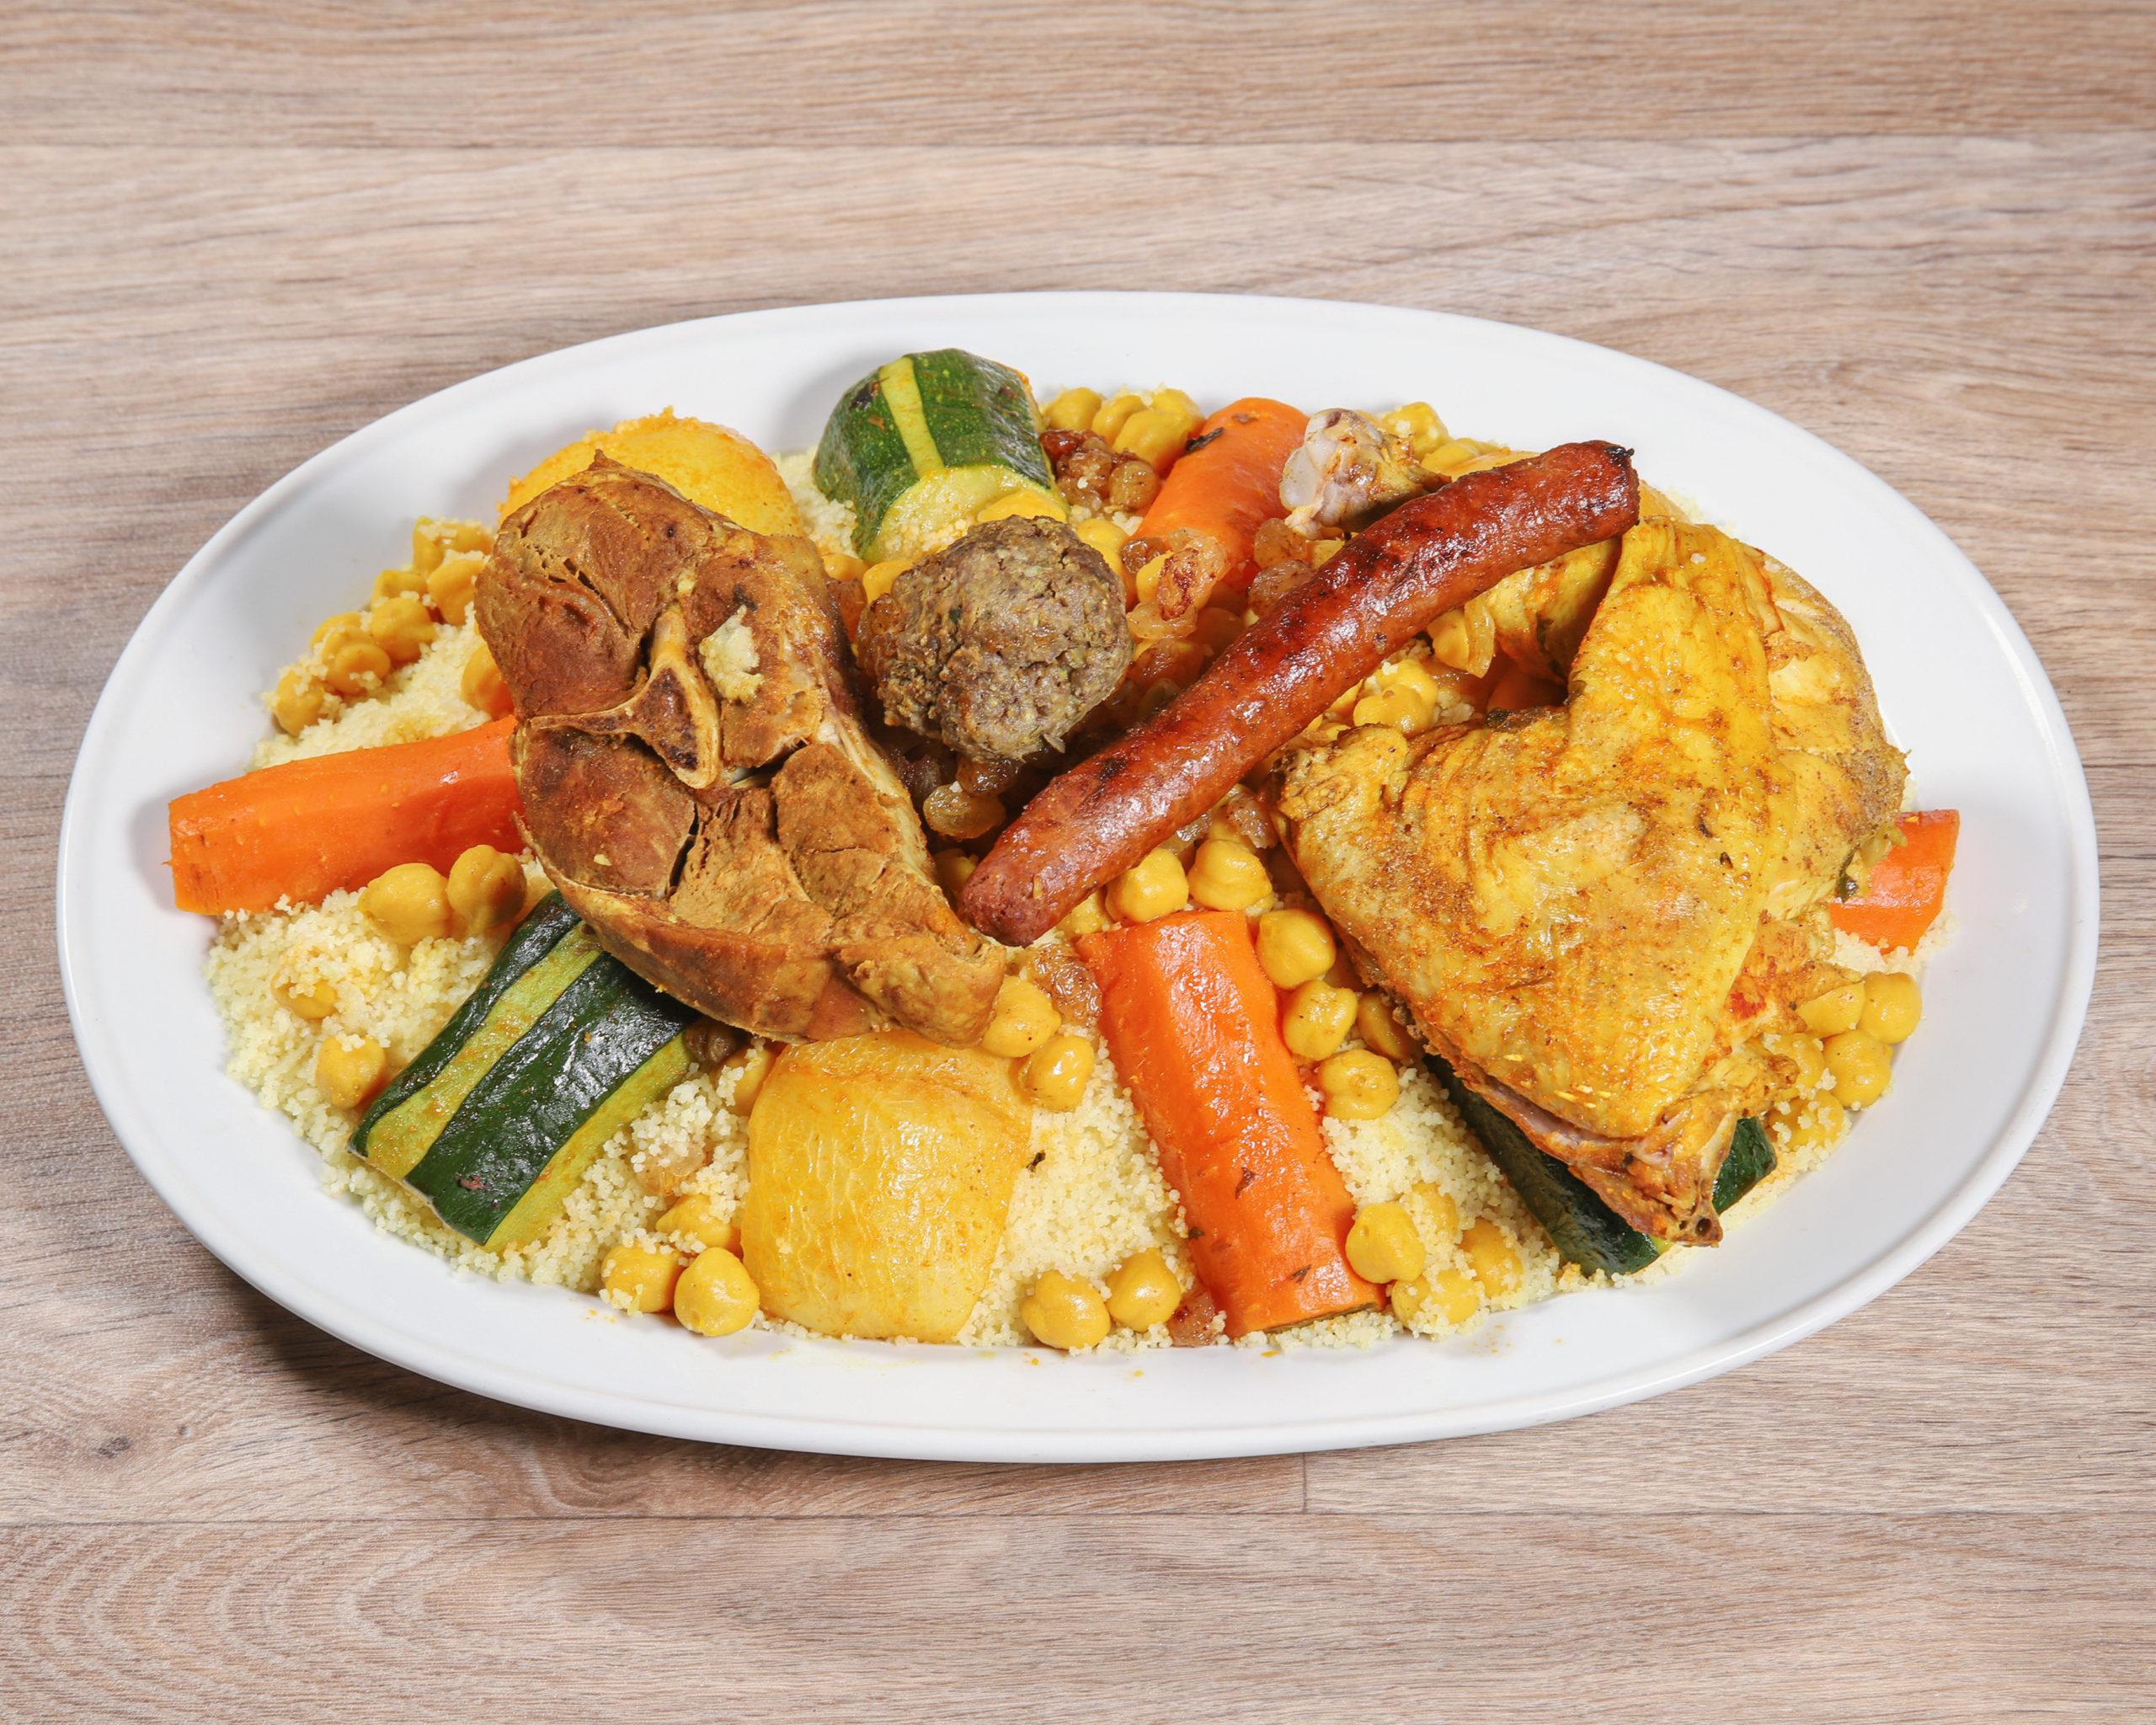 photoshoot_for_restaurant_largan__la_madeleine_couscous_royal